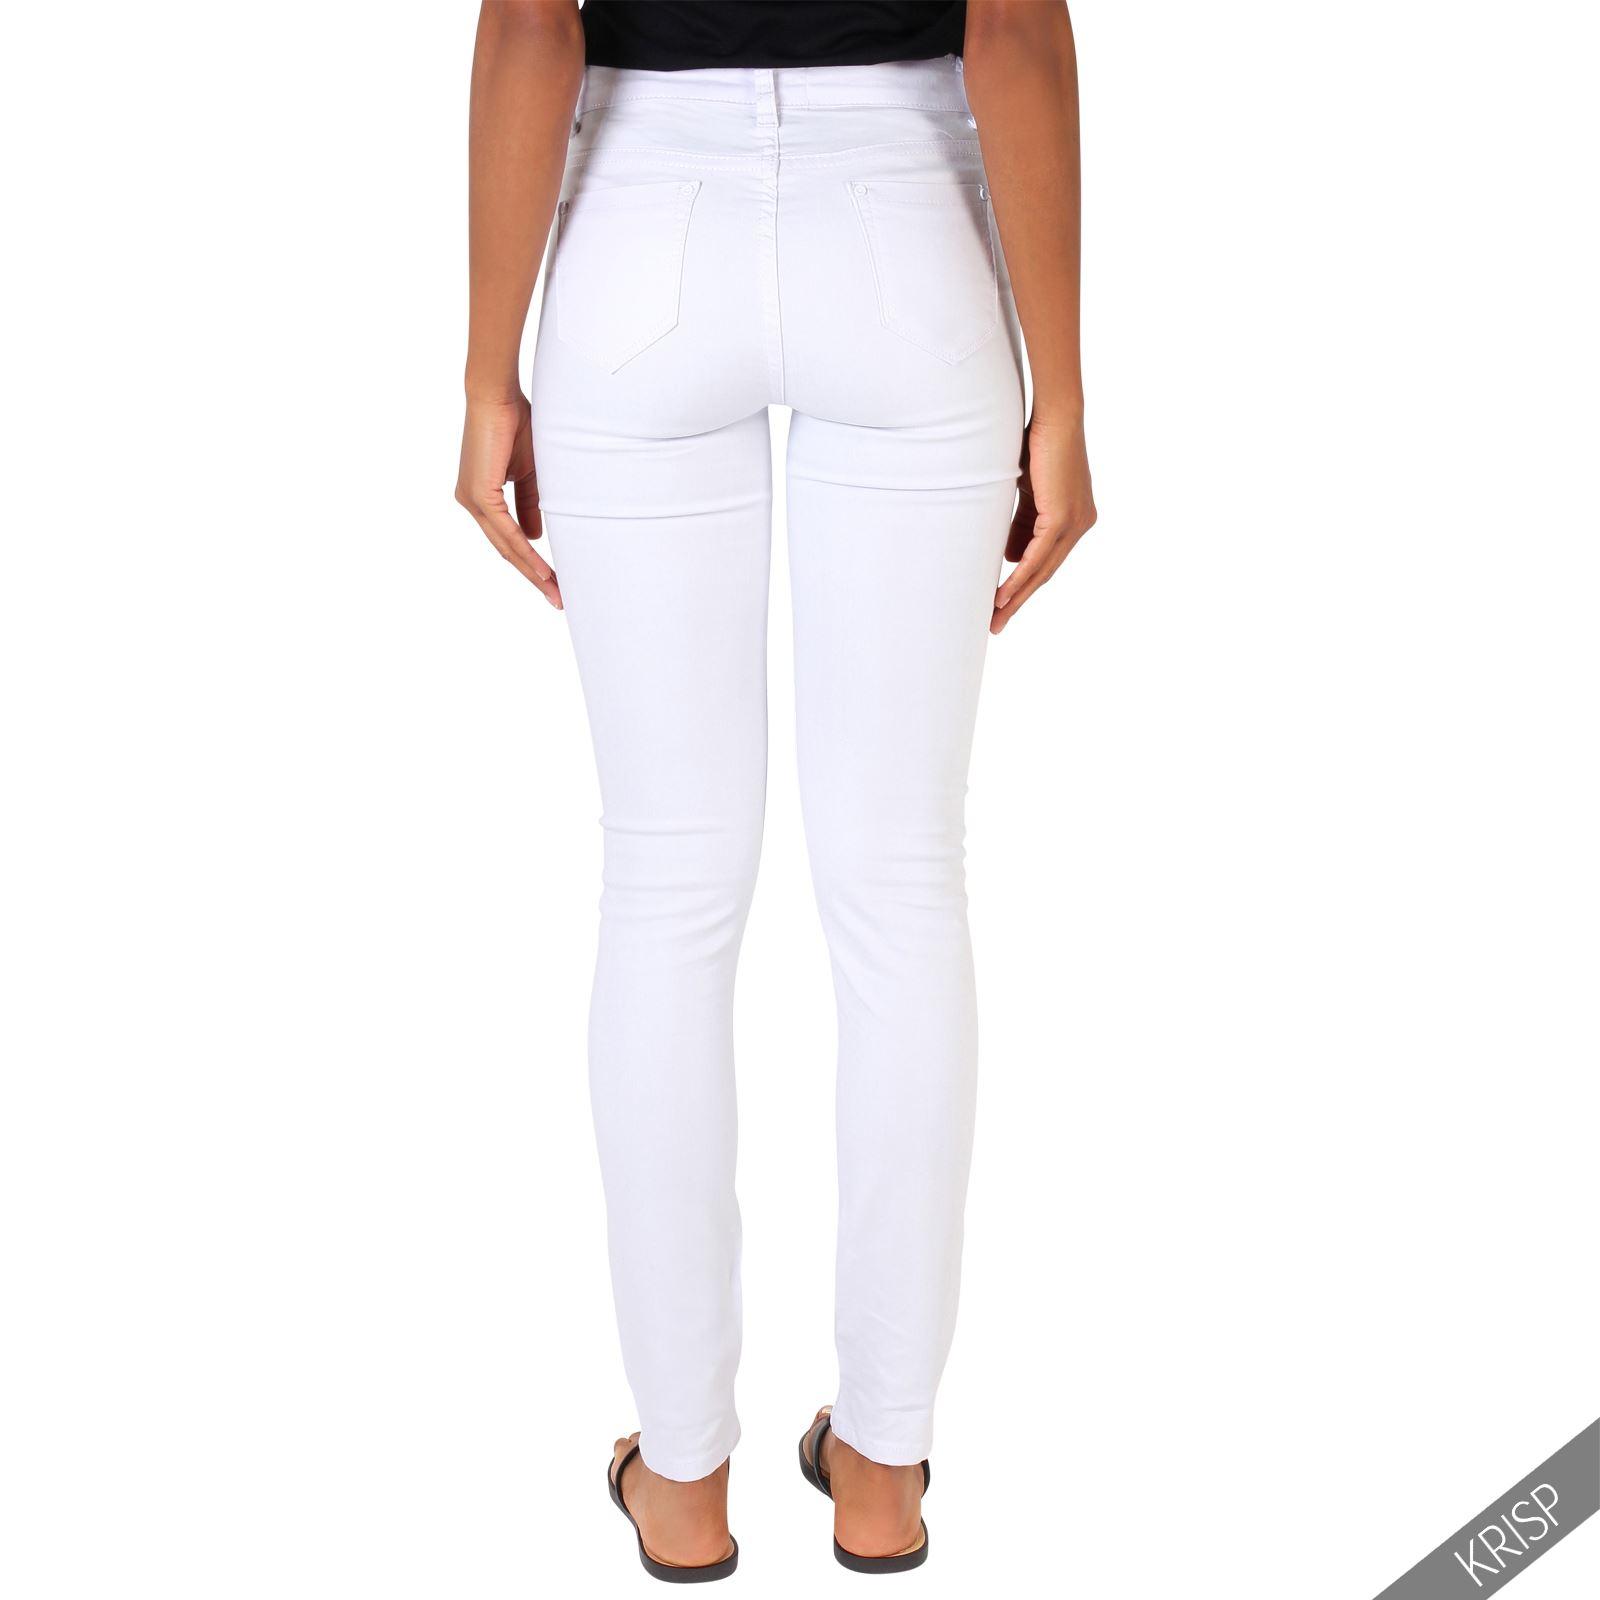 femme jean blanc taille haute trou empi cements dentelle pantalon franges mode ebay. Black Bedroom Furniture Sets. Home Design Ideas